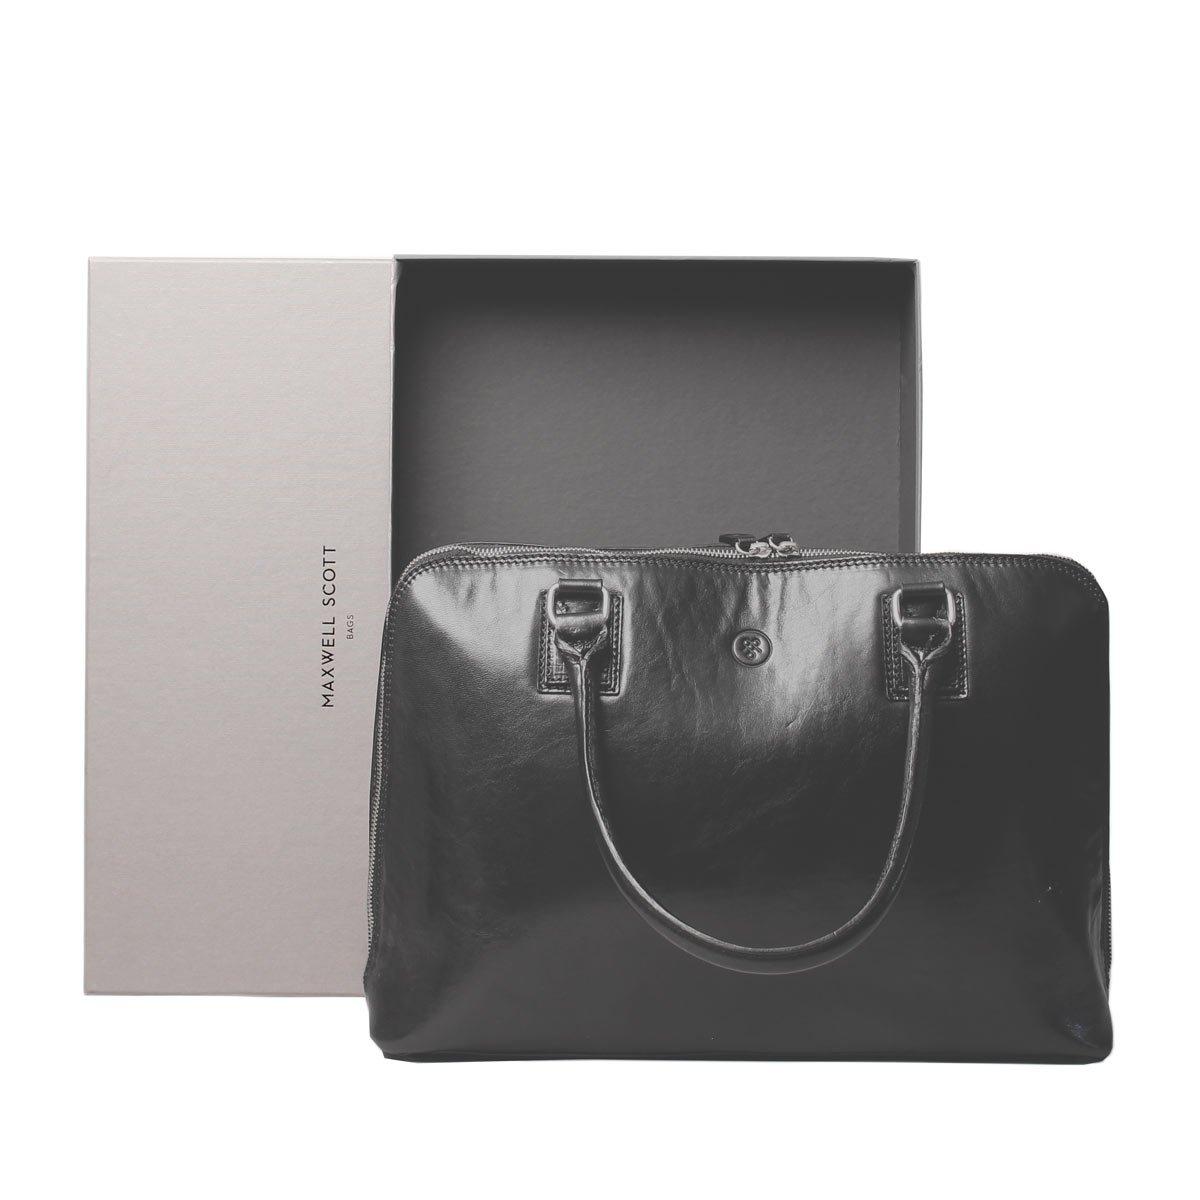 Maxwell Scott Luxury Ladies Black Leather Work Bag Purse for Macbook (Fiorella) by Maxwell Scott Bags (Image #7)